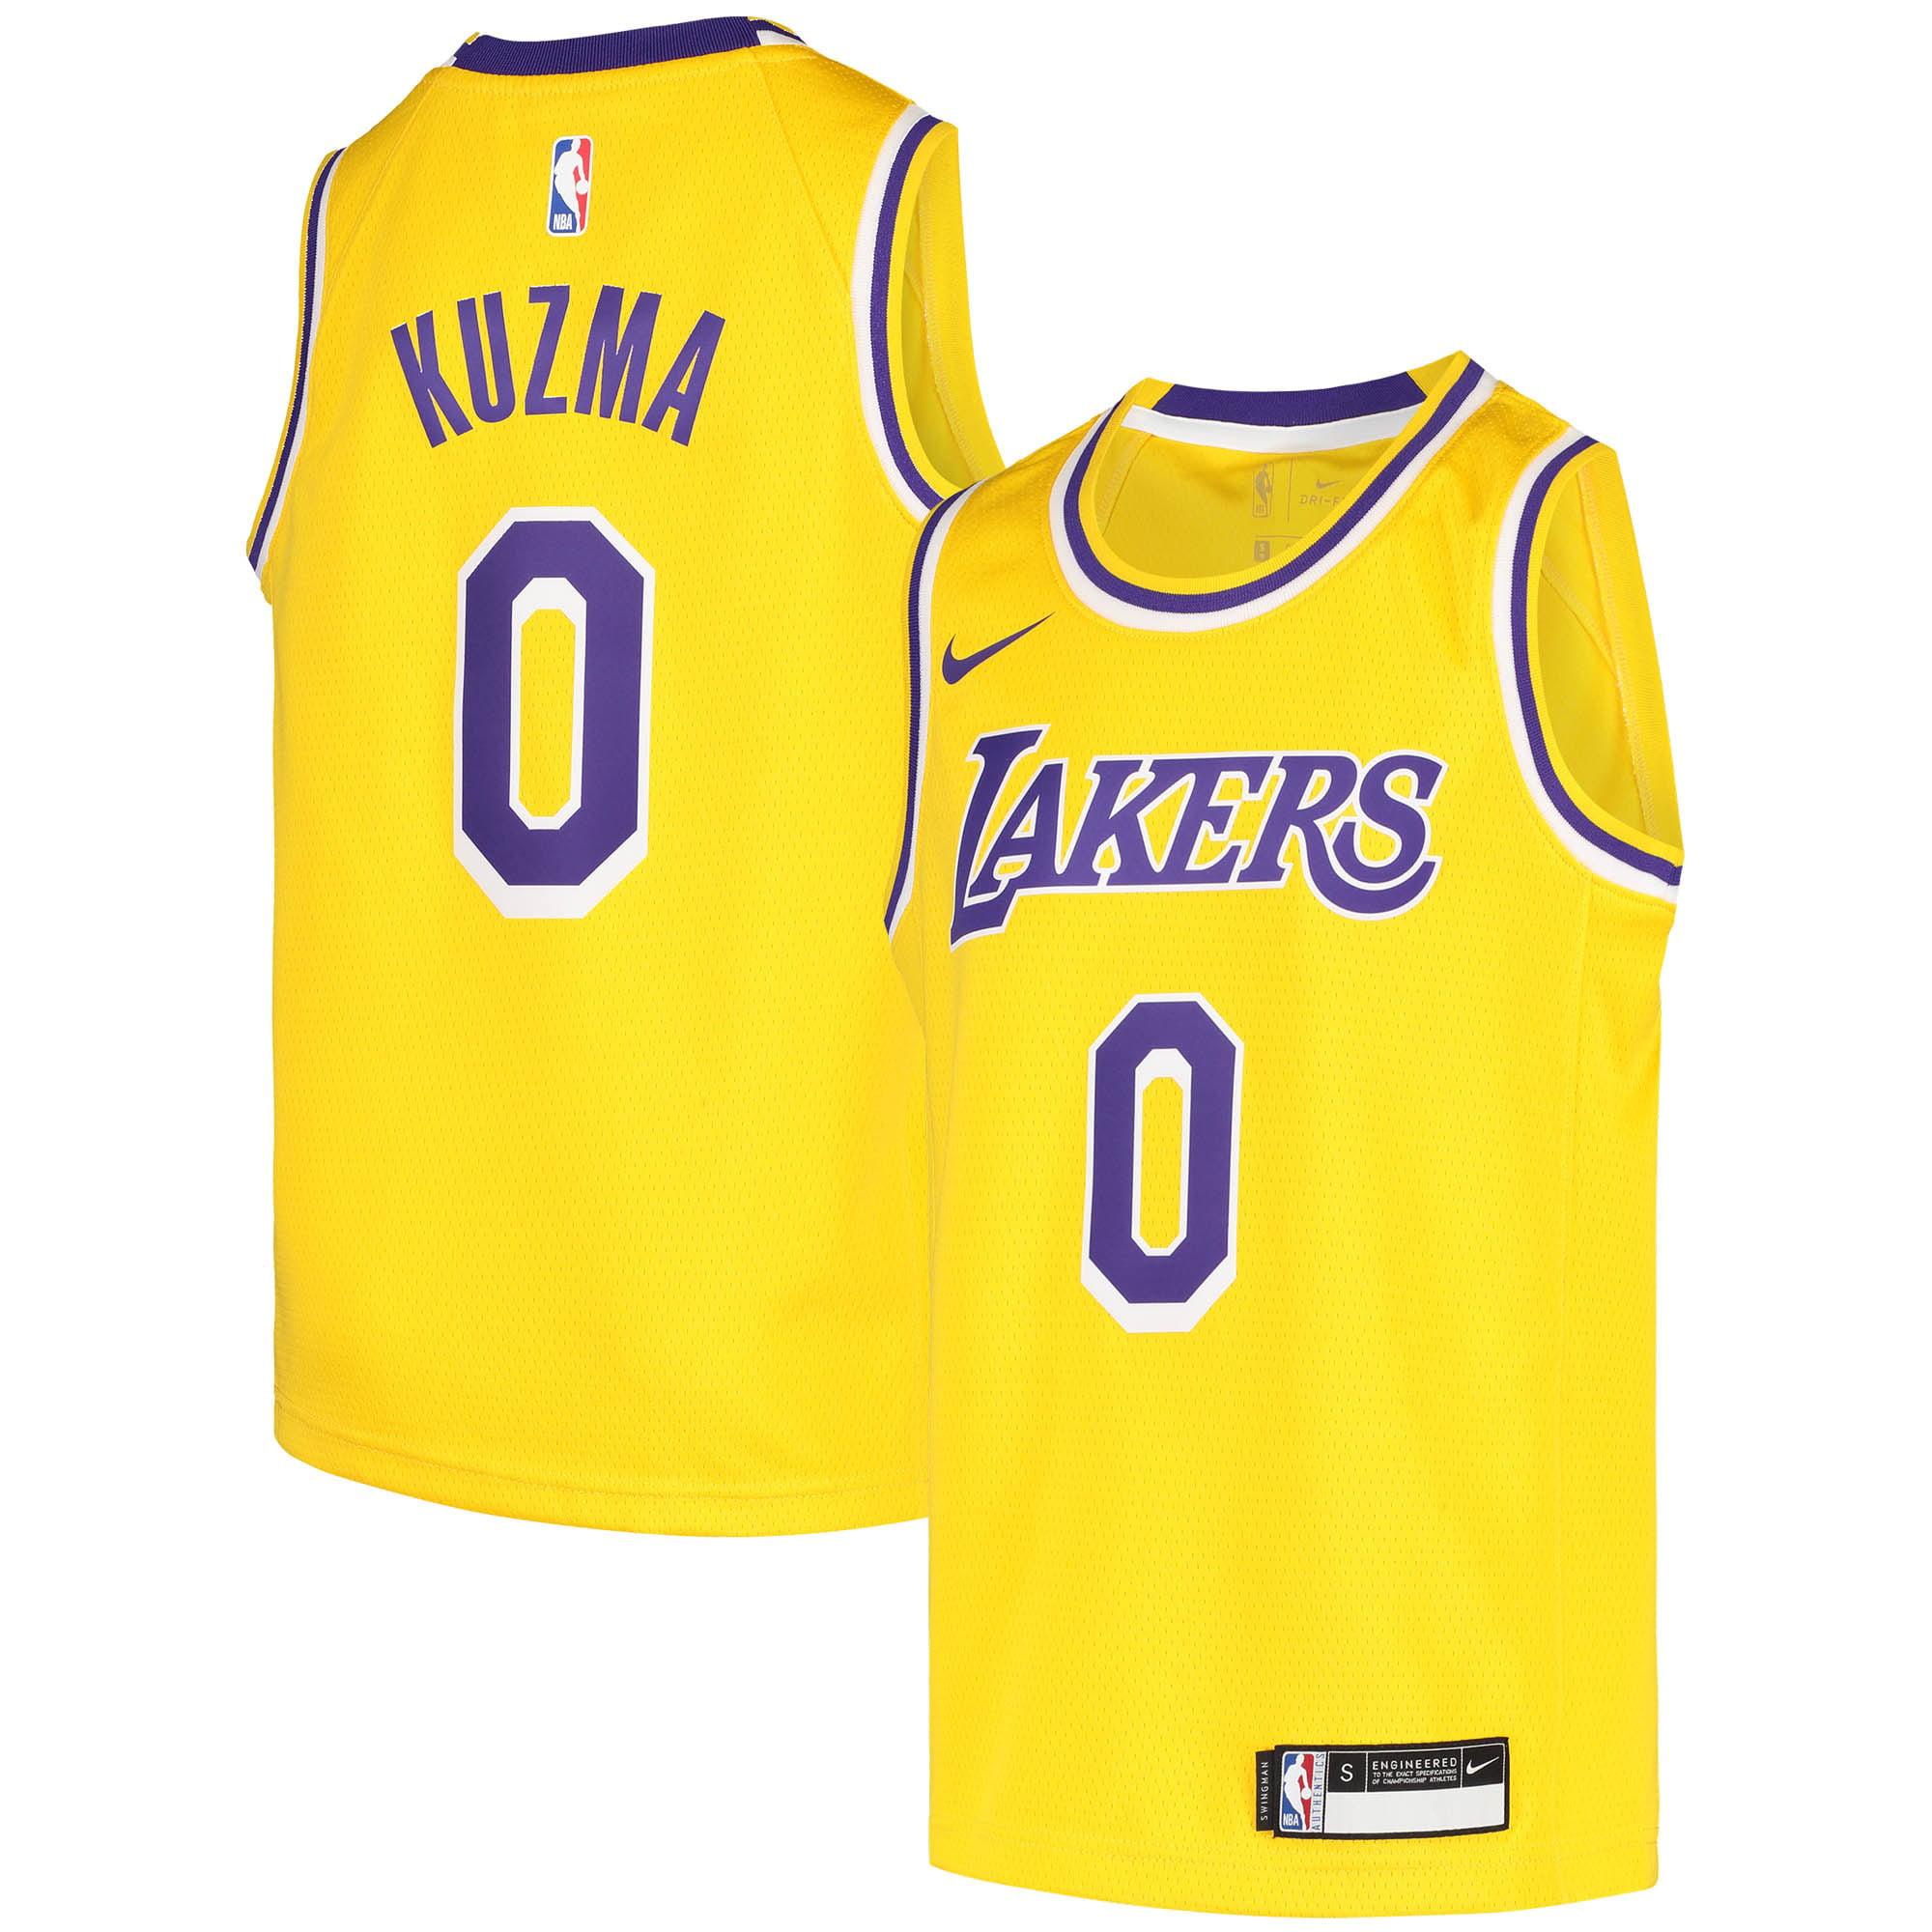 Kyle Kuzma Los Angeles Lakers Nike Youth 2020/21 Swingman Jersey - Icon Edition - Gold